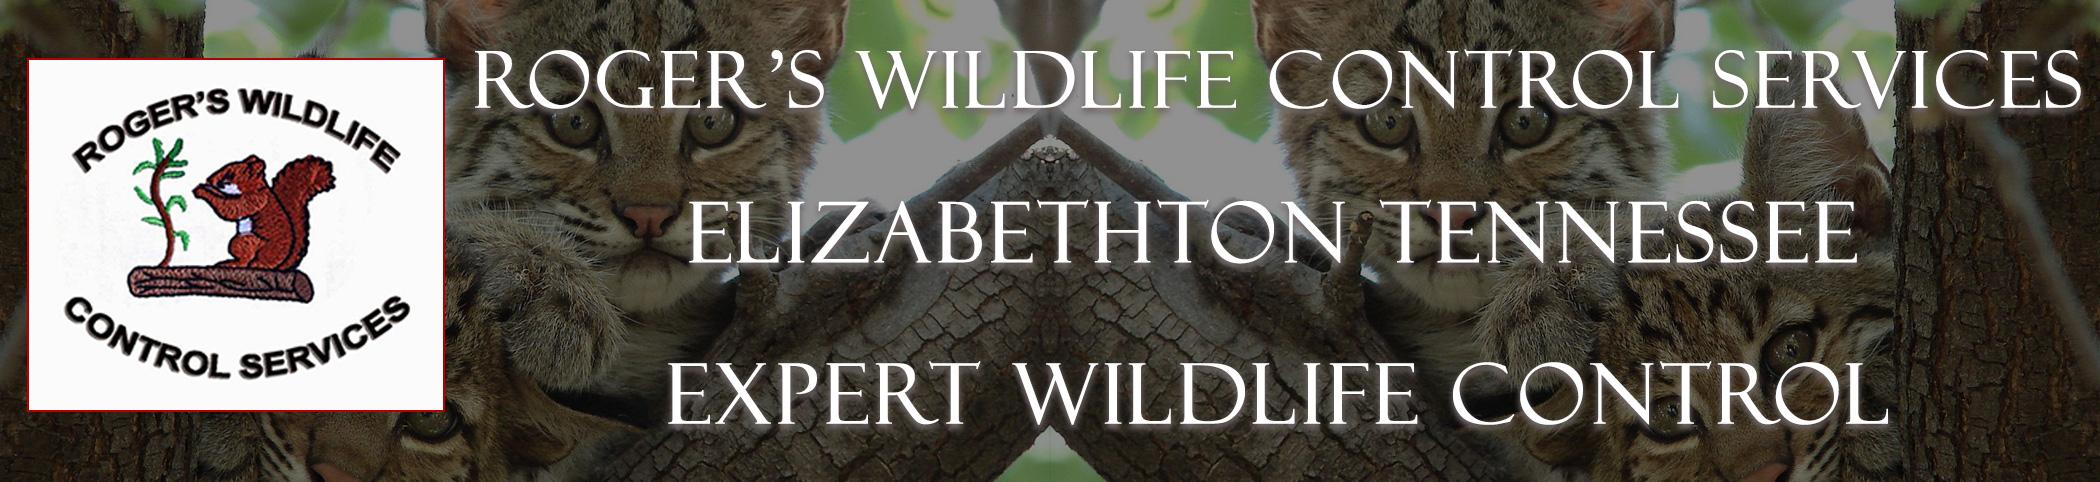 rogers_wildlife_Elizabethton_TN_headers